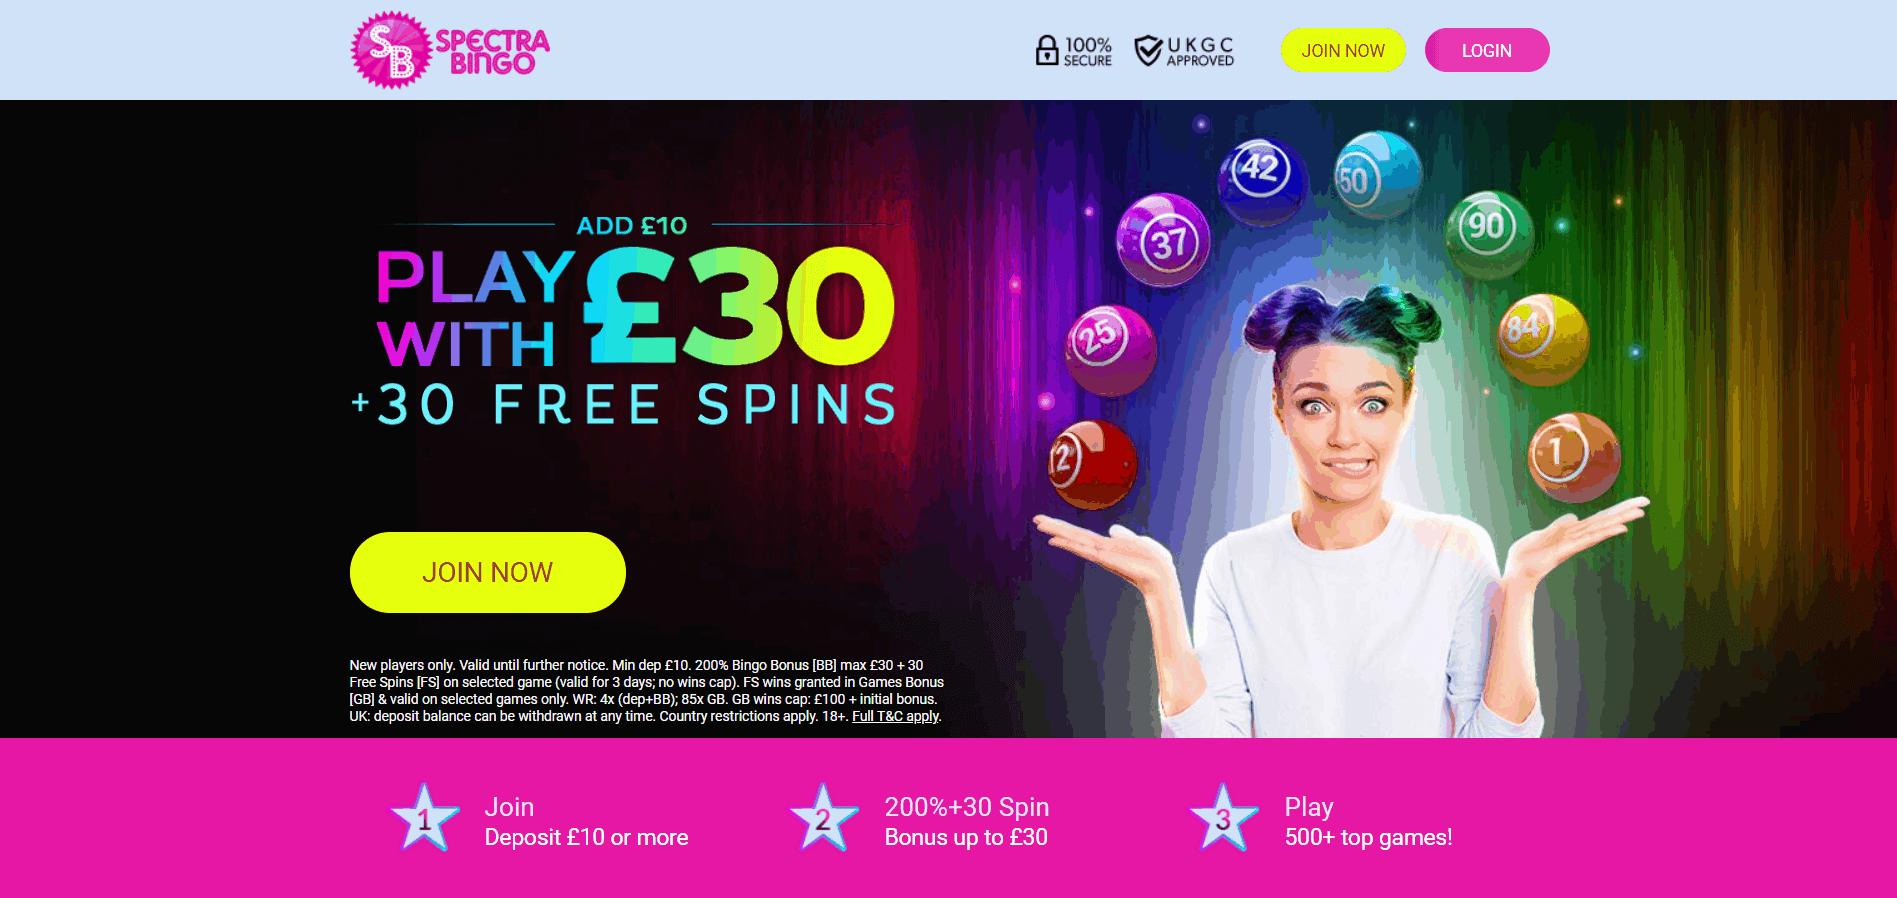 Spectra Bingo welcome bonus